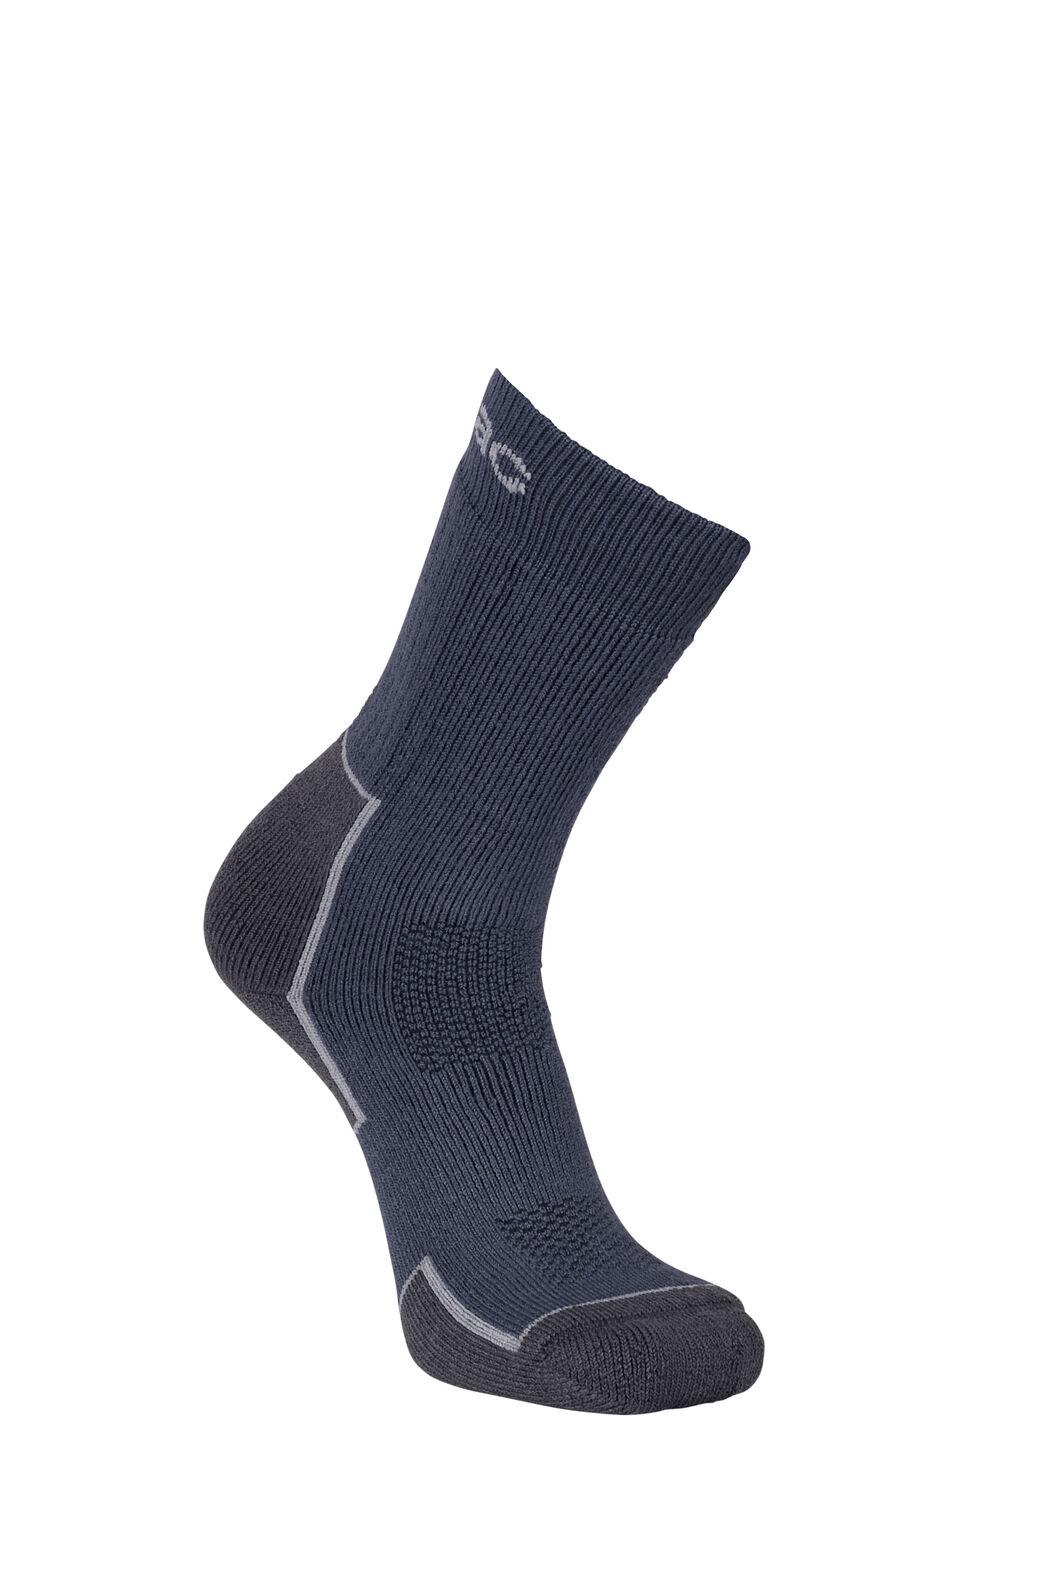 Macpac Merino Blend Hike Socks, Poseidon, hi-res